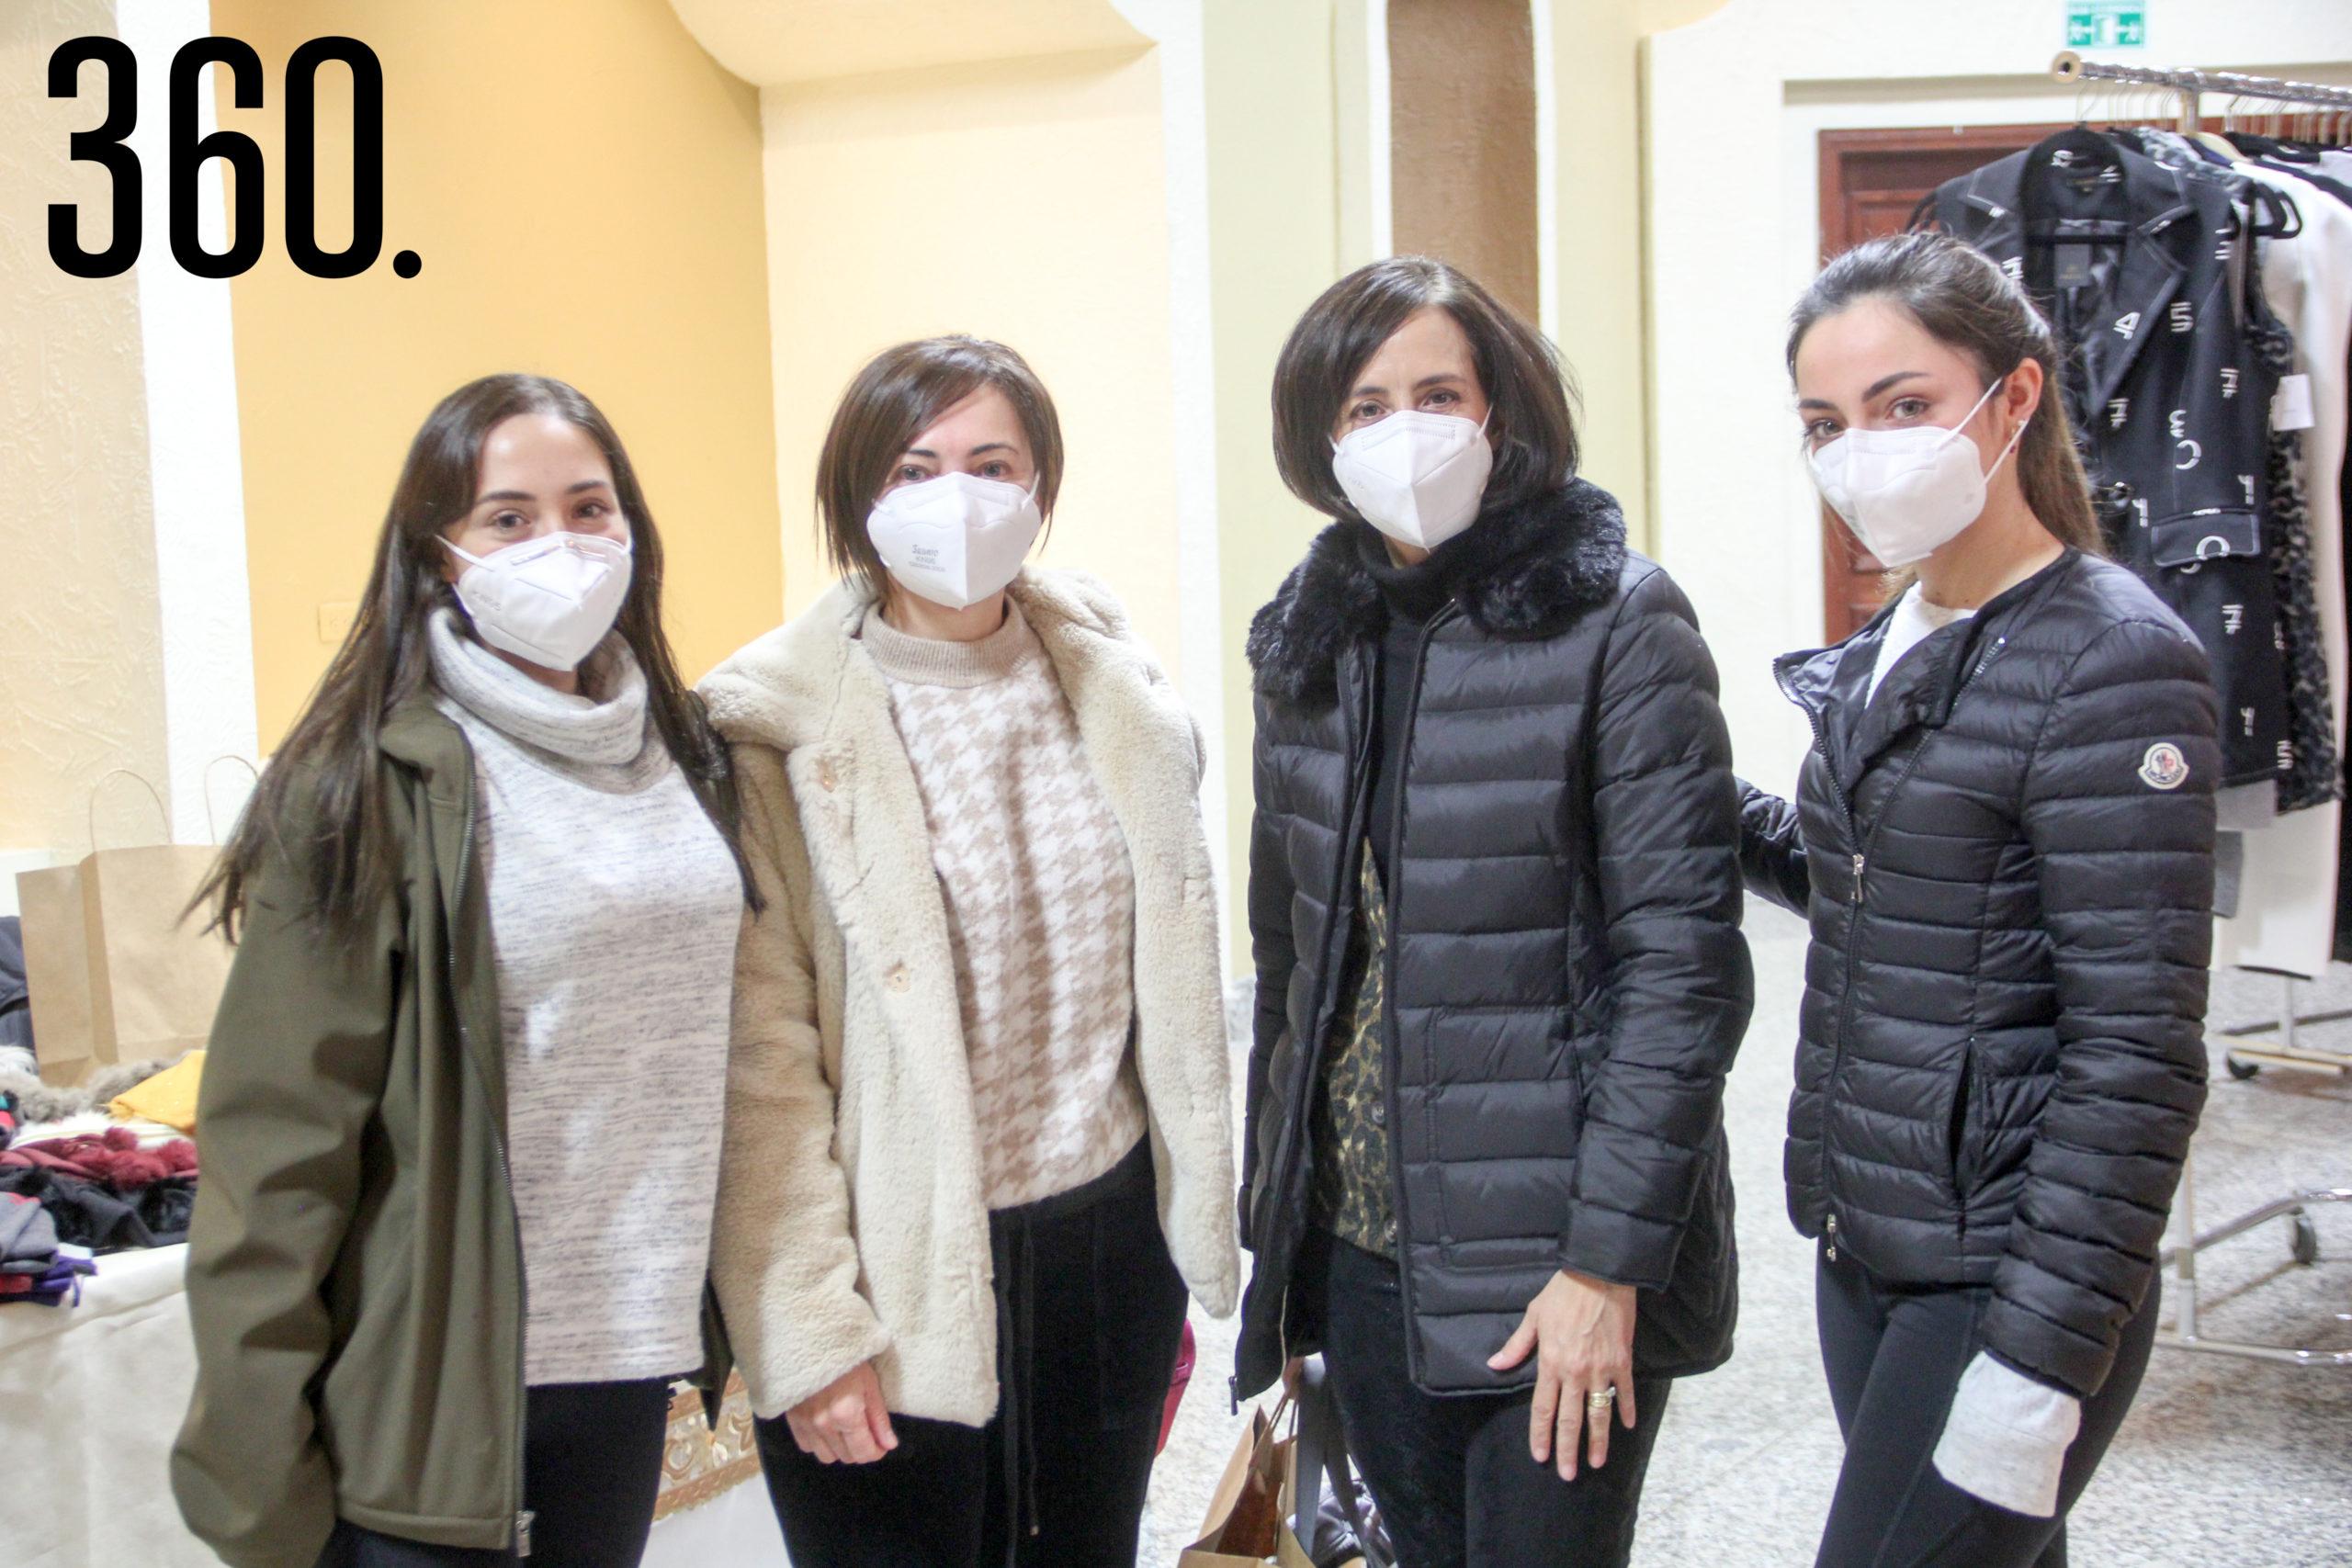 Mariana Garza, Rosita Dávila, Adriana Ramos y Daniela Garza.